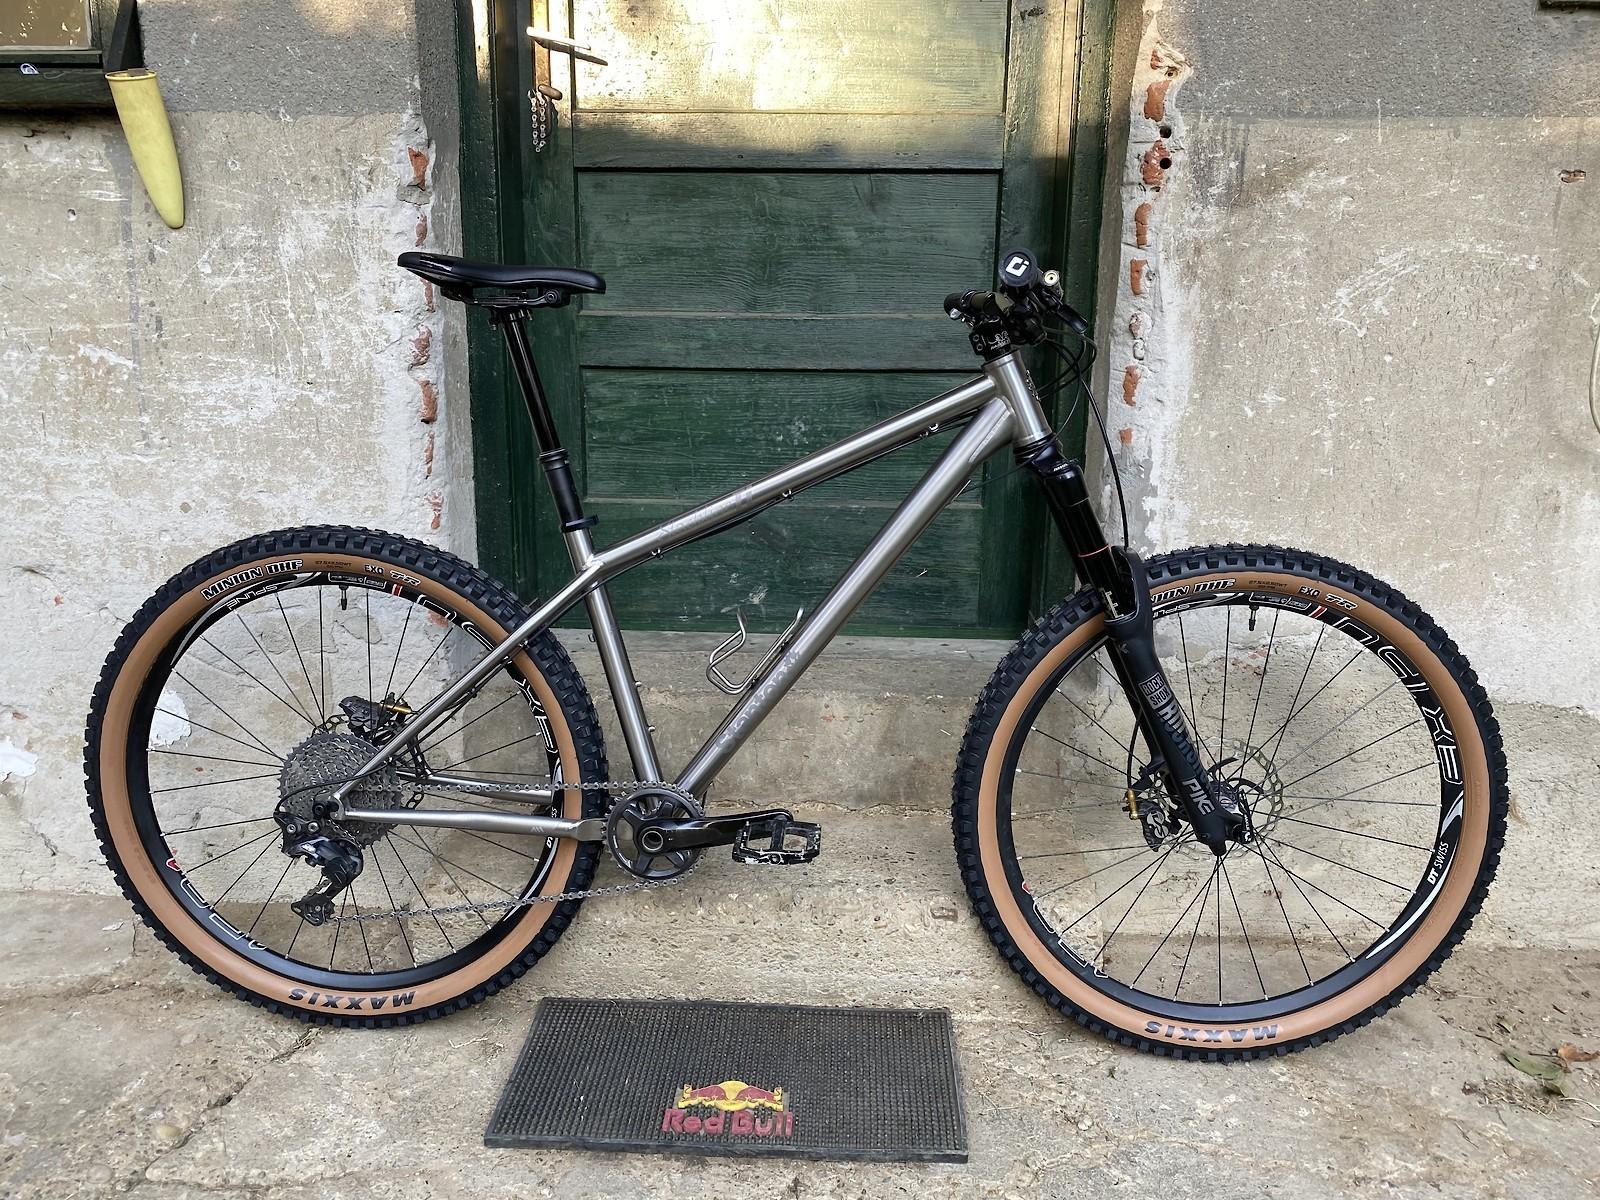 Stanton Slackline Titanium - Vital Bike of the Day October 2021 - Mountain Biking Pictures - Vital MTB